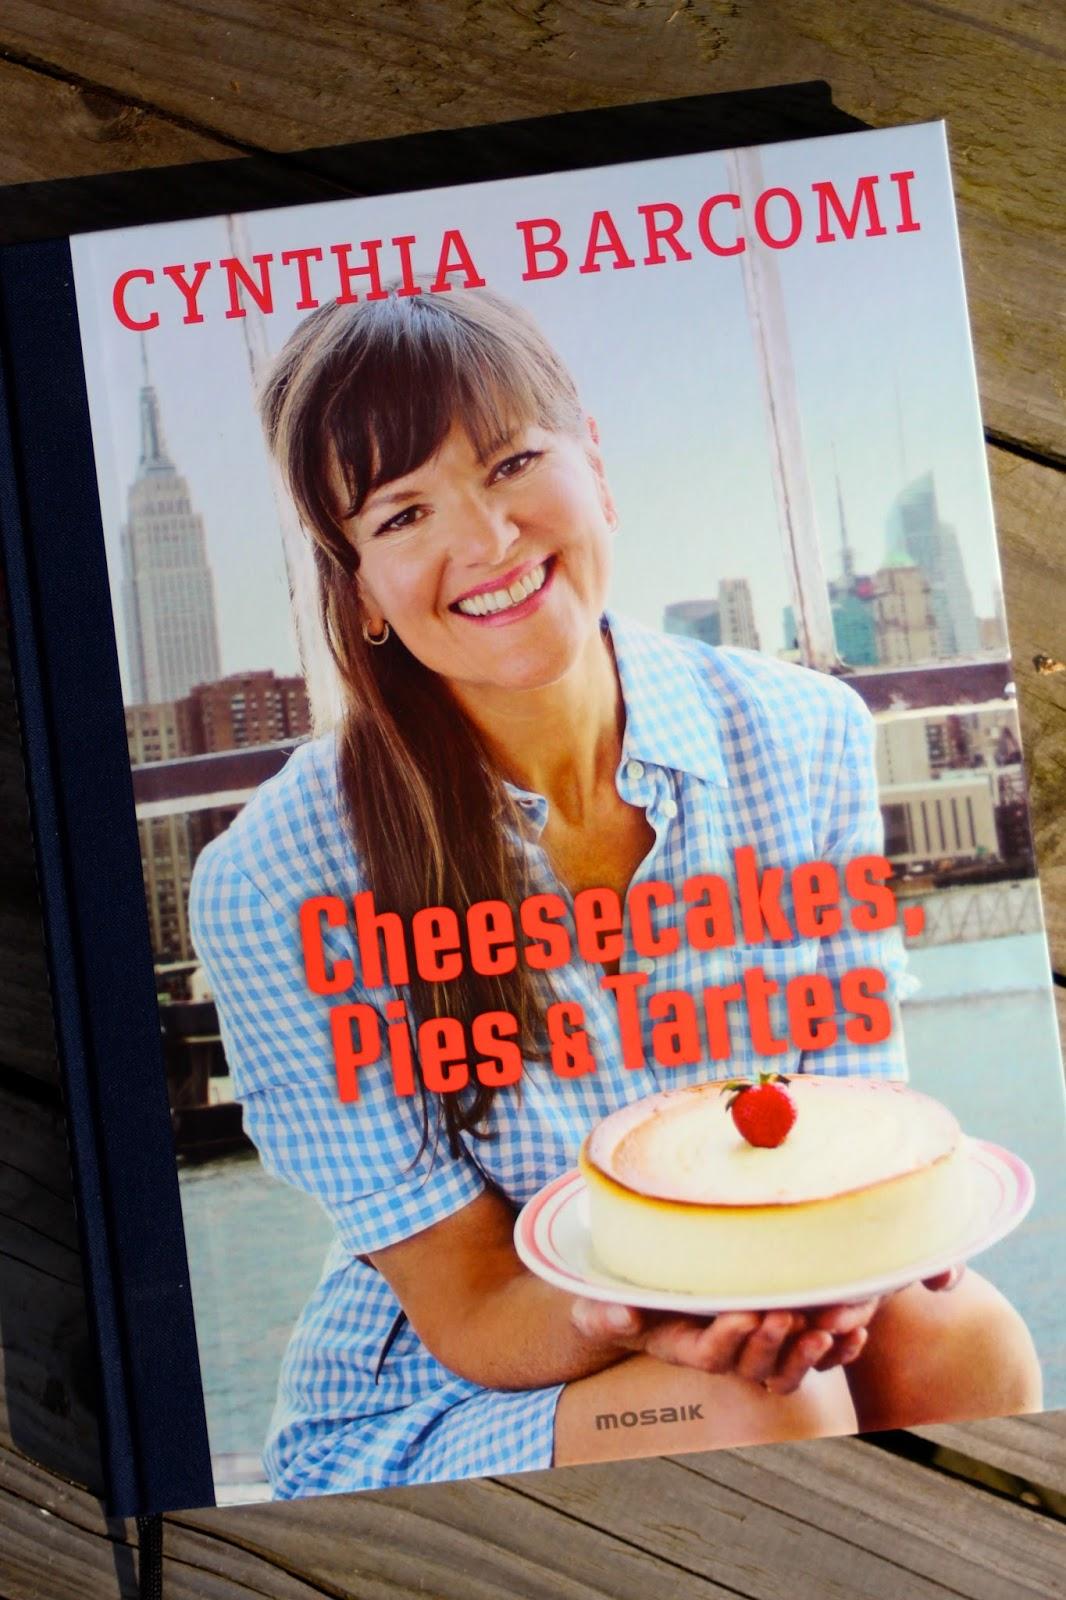 paulas frauchen new york cheesecake von cynthia barcomi. Black Bedroom Furniture Sets. Home Design Ideas